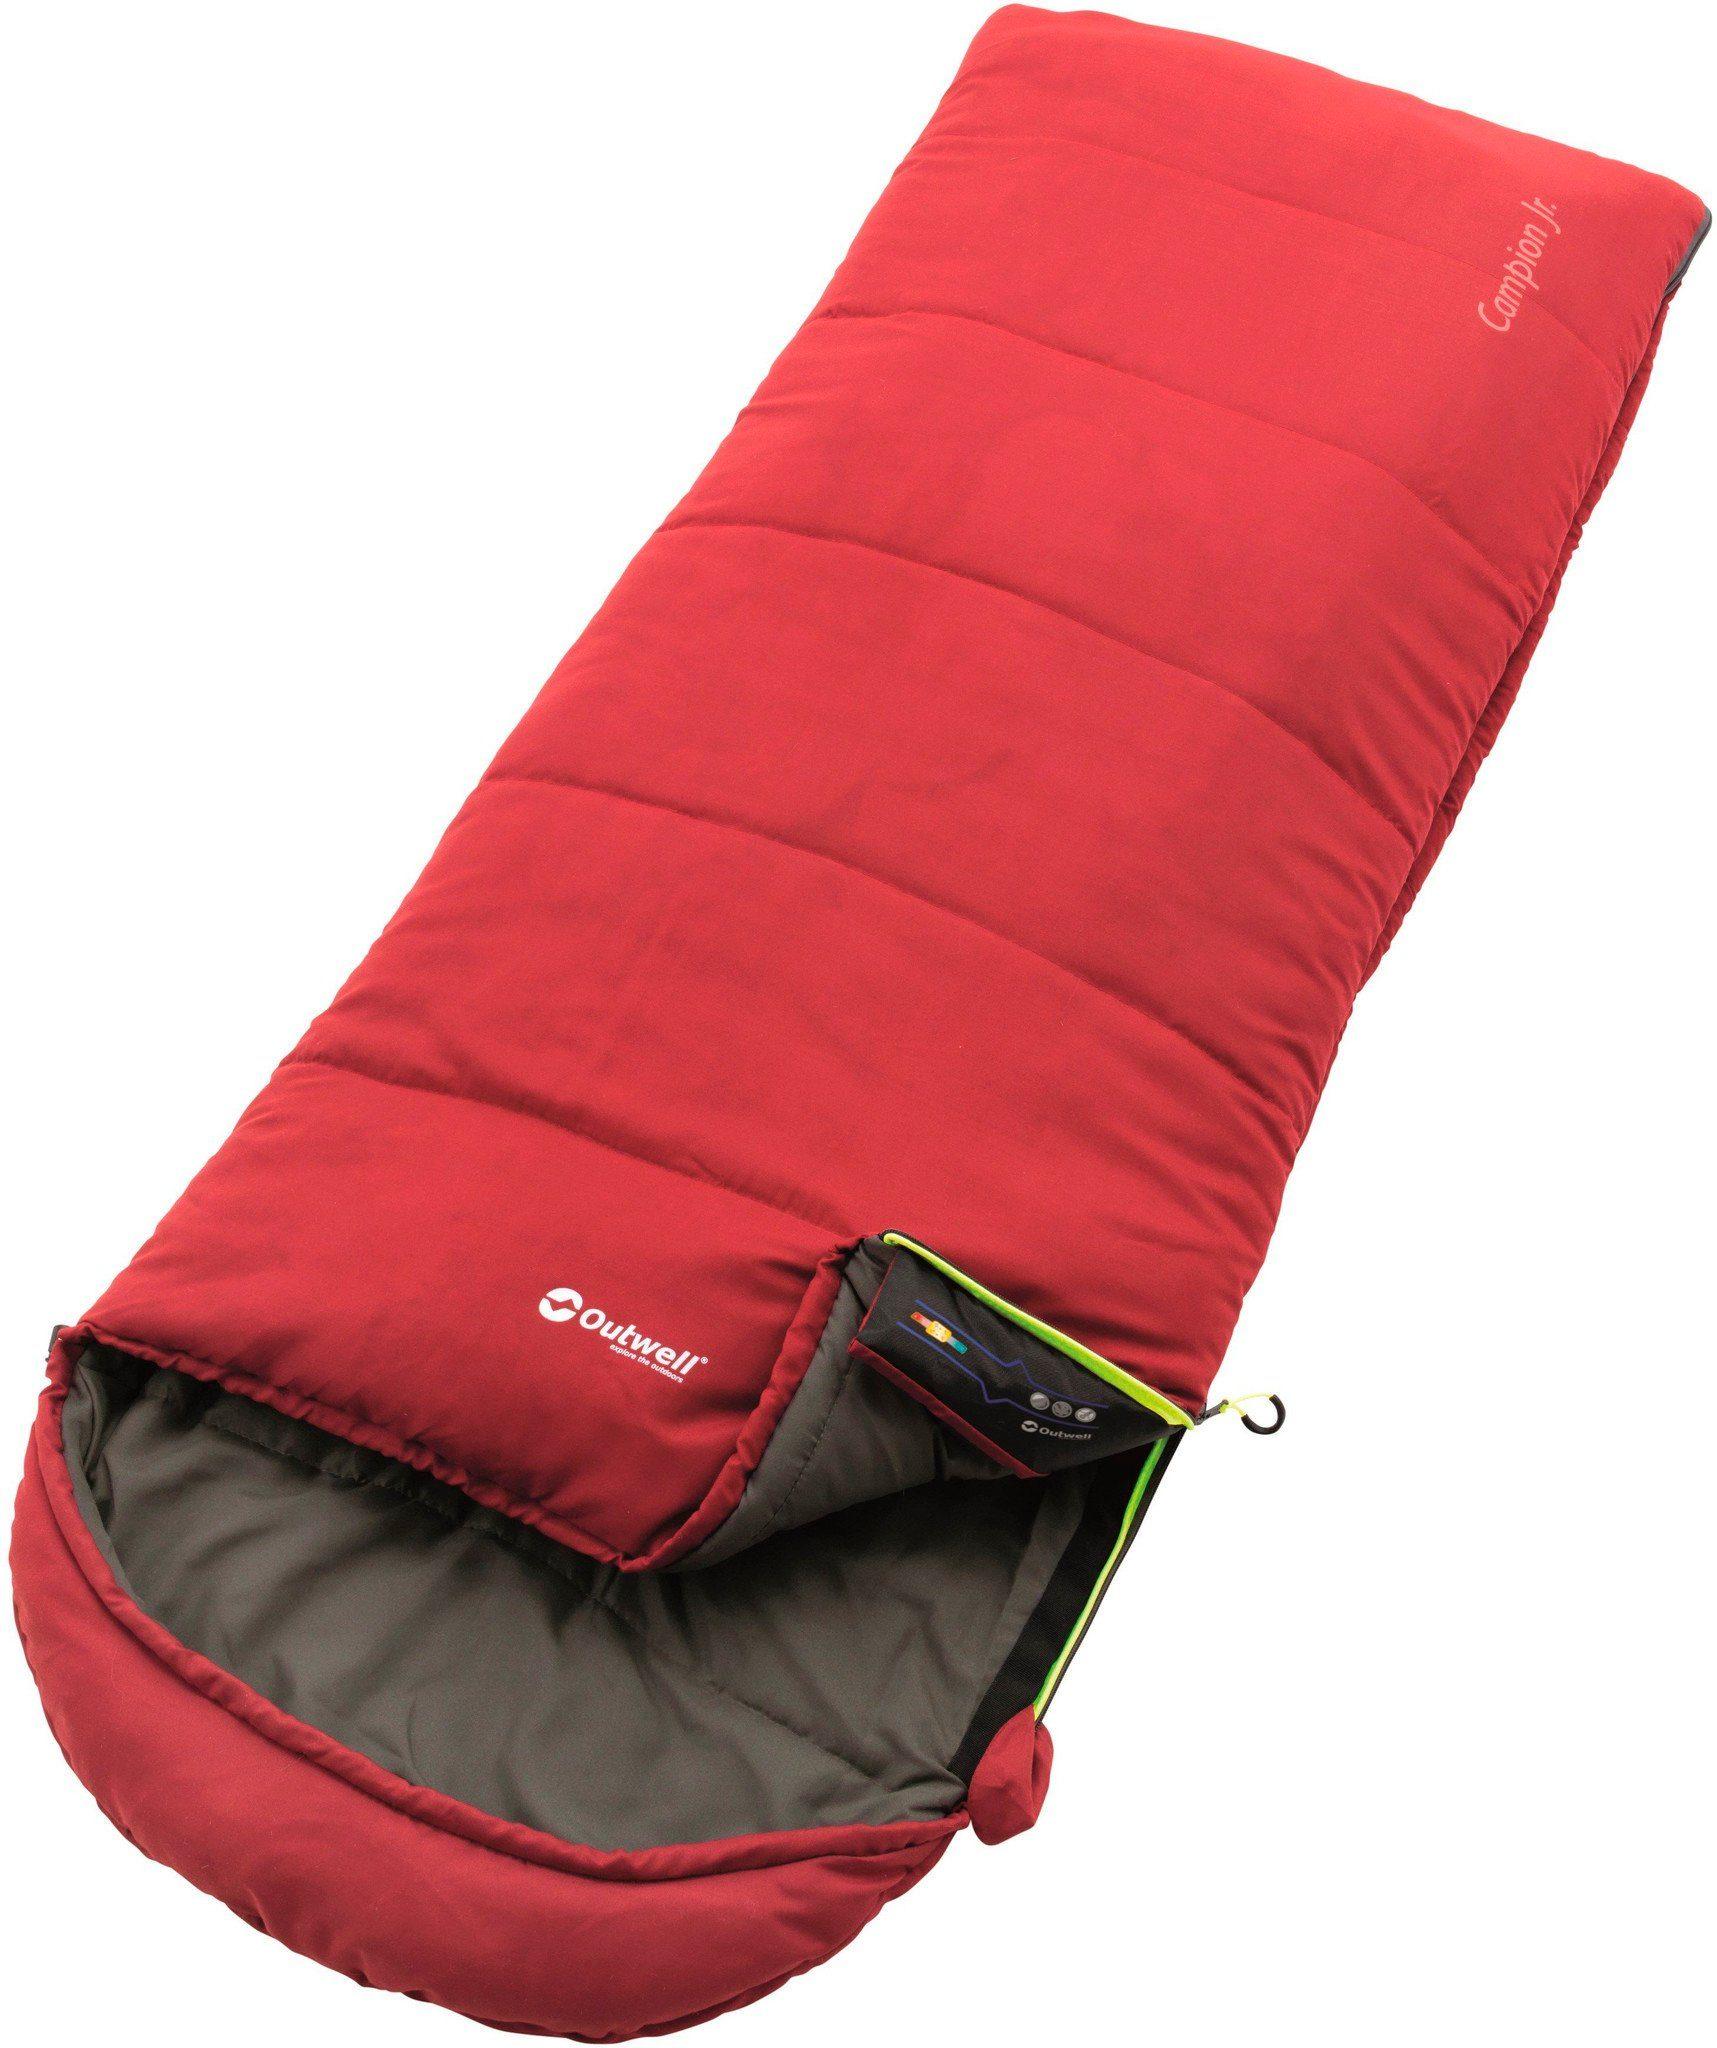 Outwell Schlafsack »Campion Sleeping Bag Junior«